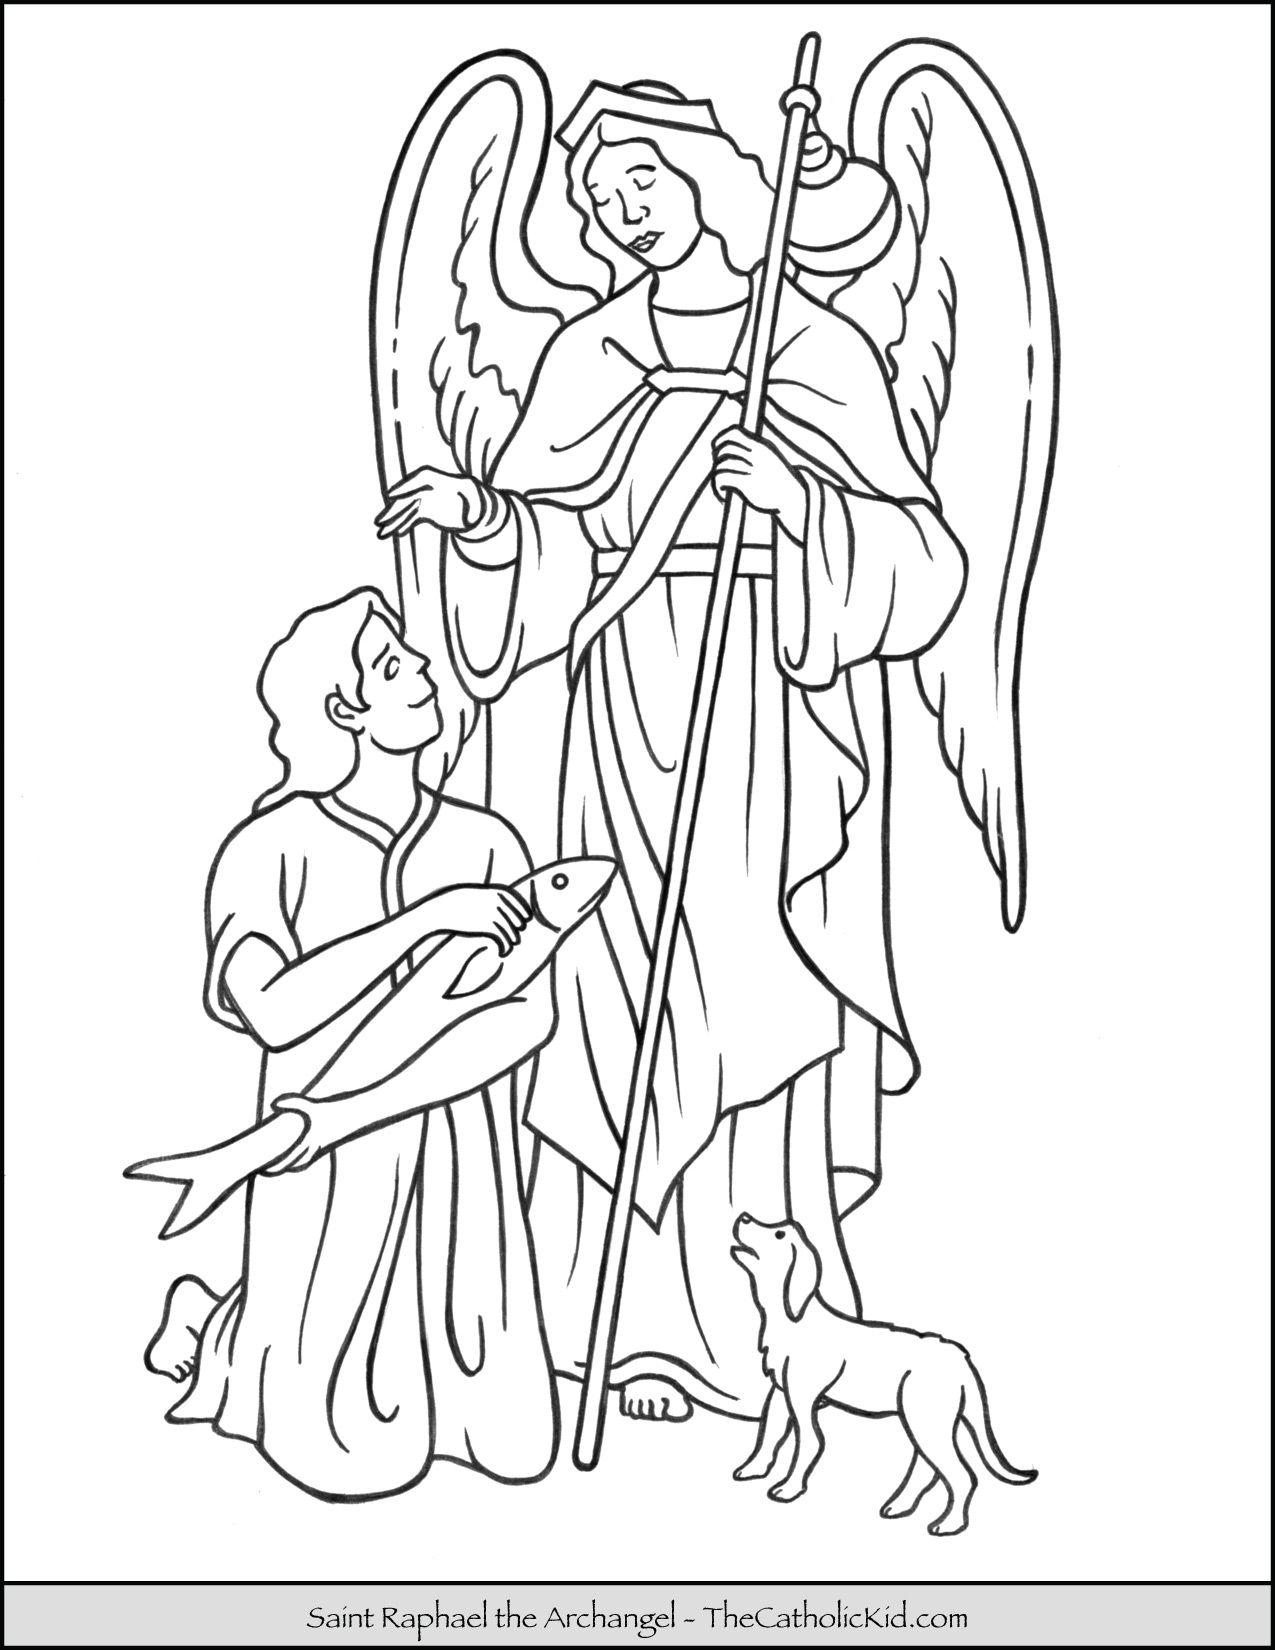 Saint Raphael Archangel Coloring Page Thecatholickid Com St